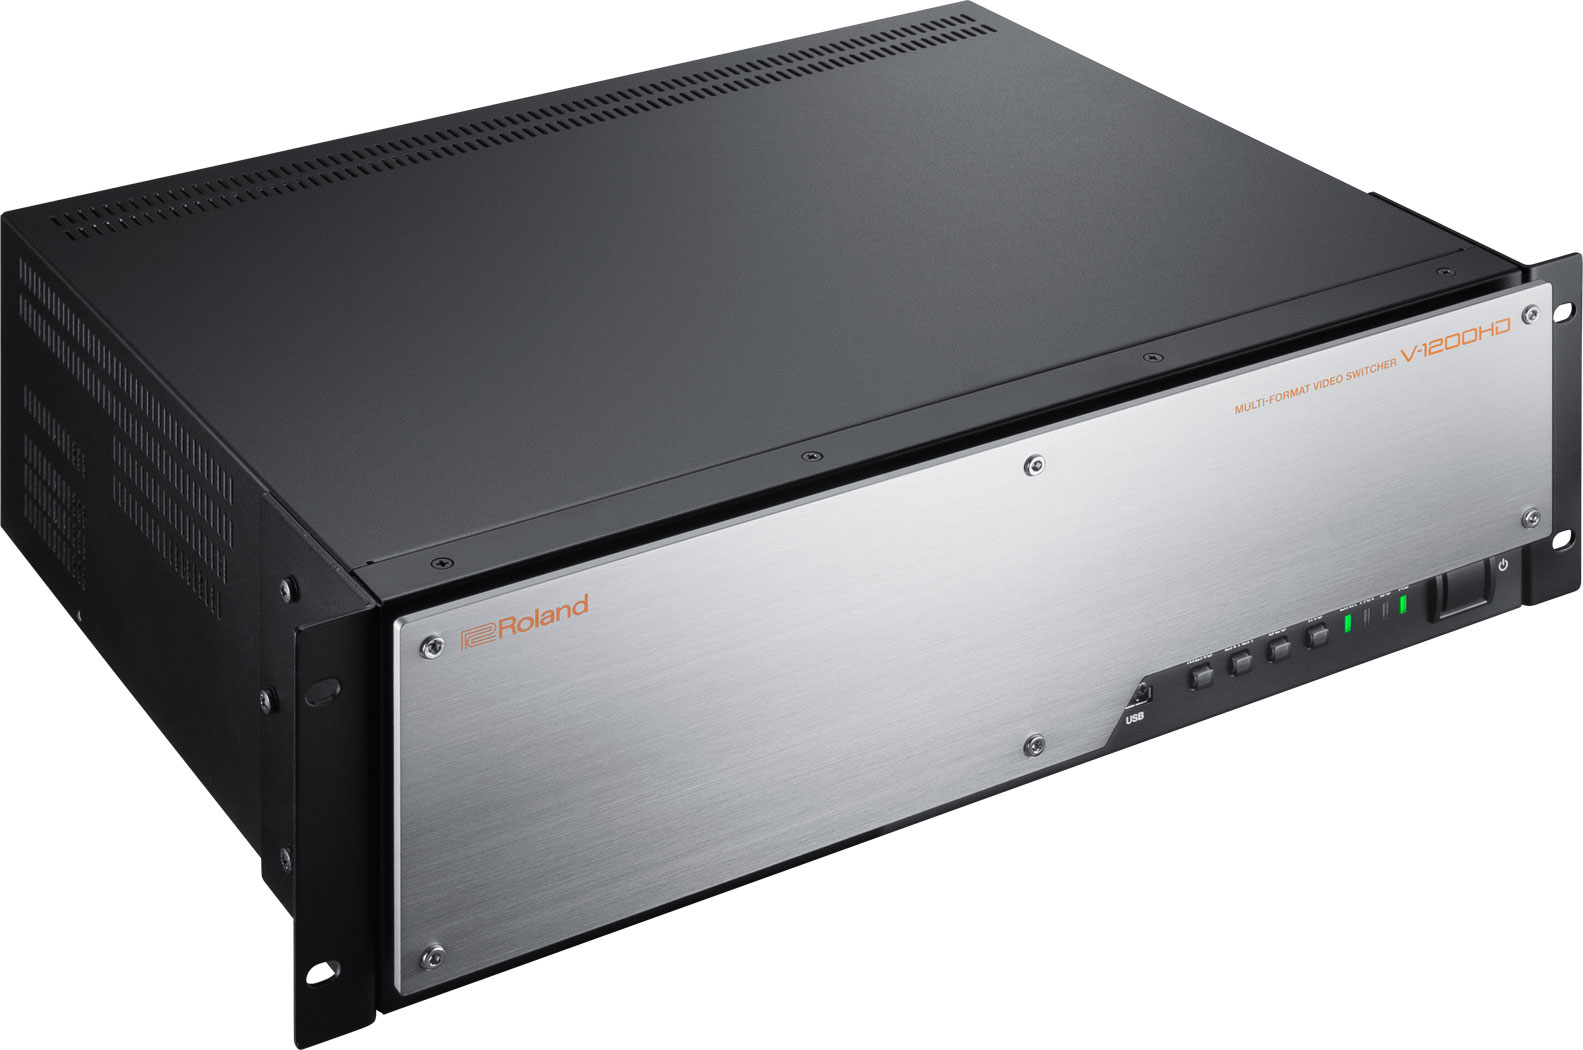 Roland Pro A V 1200hd Multi Format Video Switcher Block Diagram Hpdeskjet300400